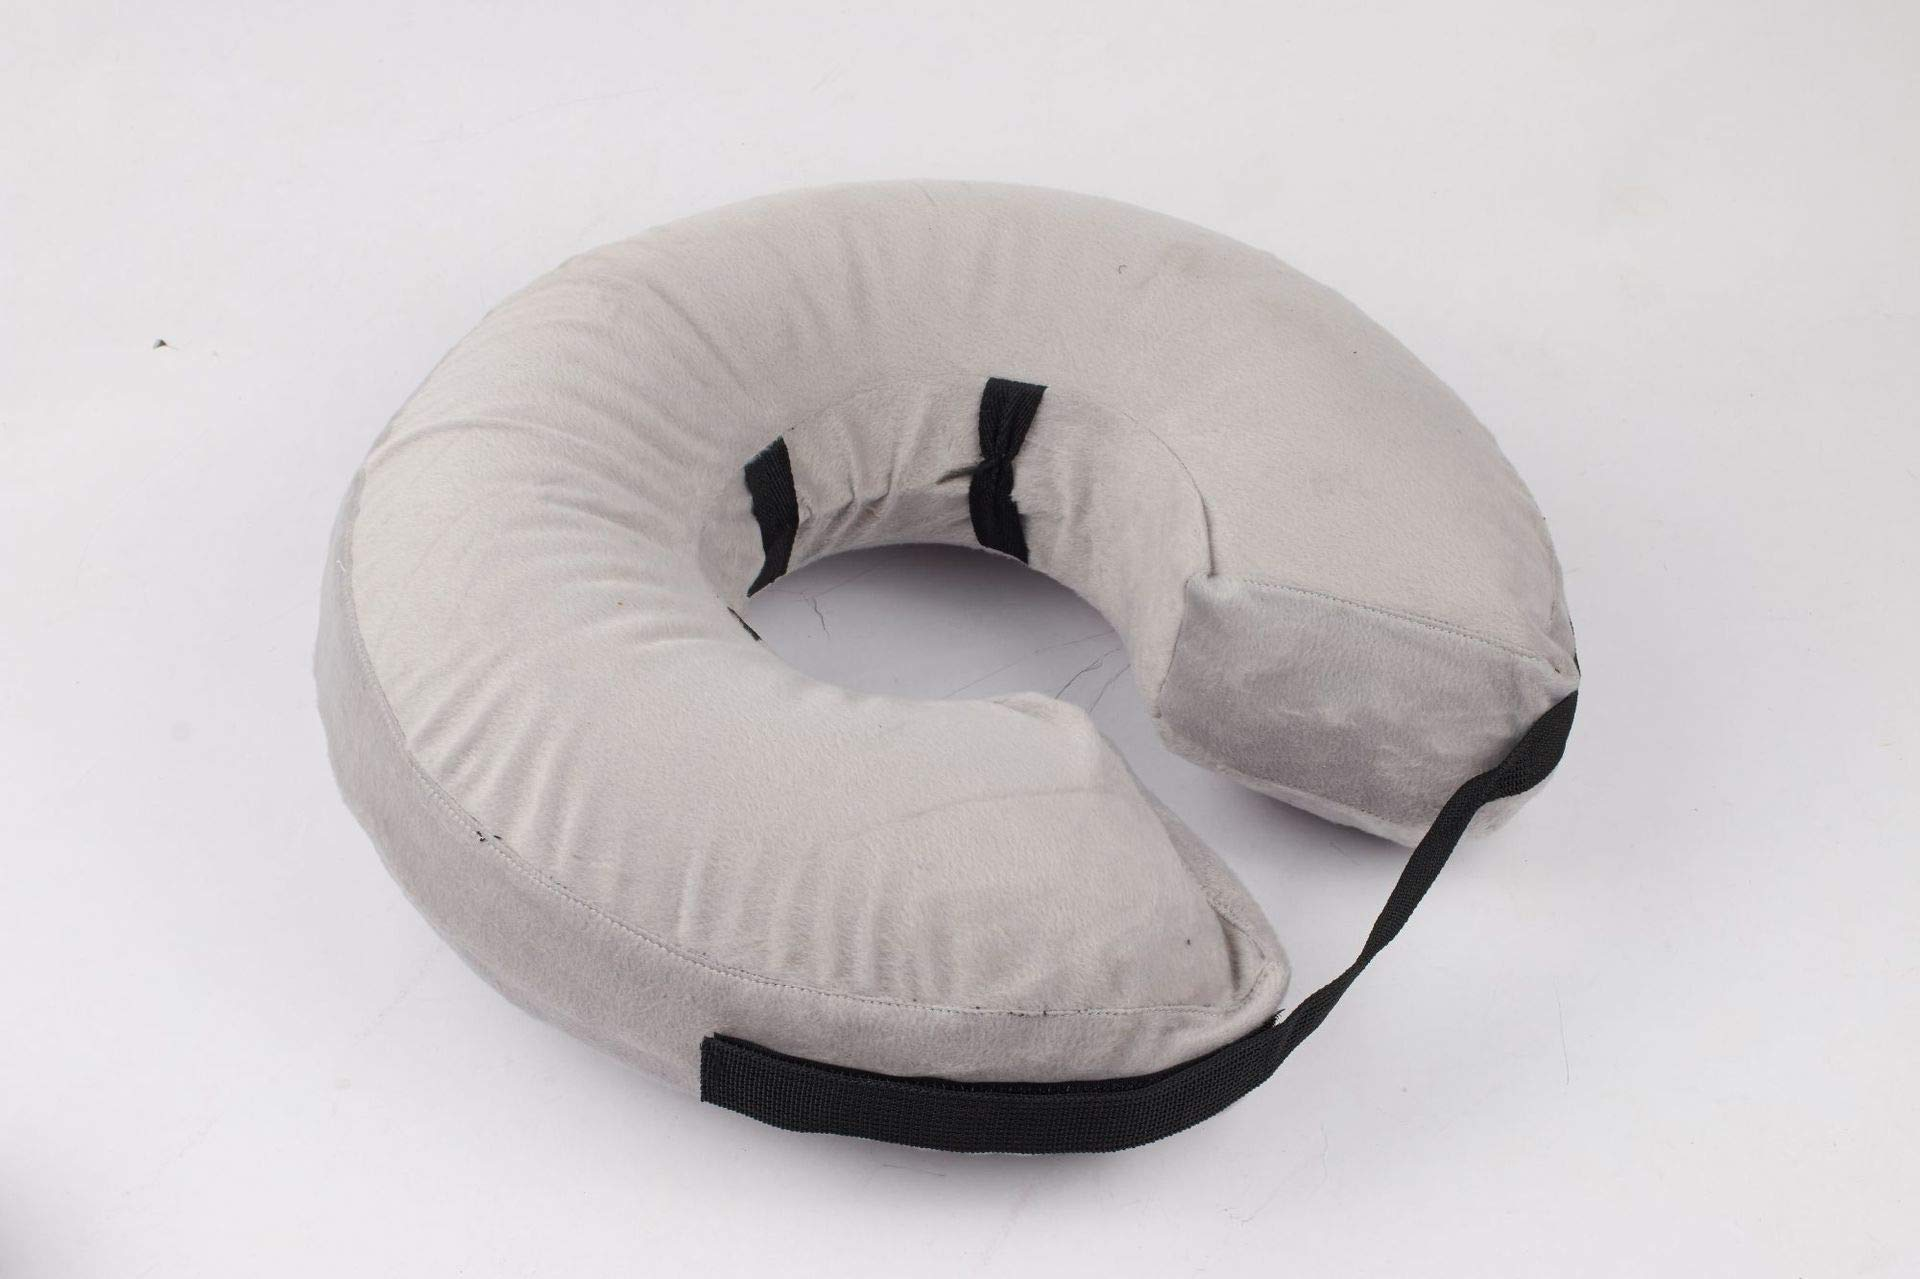 Yevison Pet Headgear Hat Pet Inflatable Neck Ring Anti-Biting Ring Anti-Licking Ring pet Hood Cover Neck Circumference 12-20cm